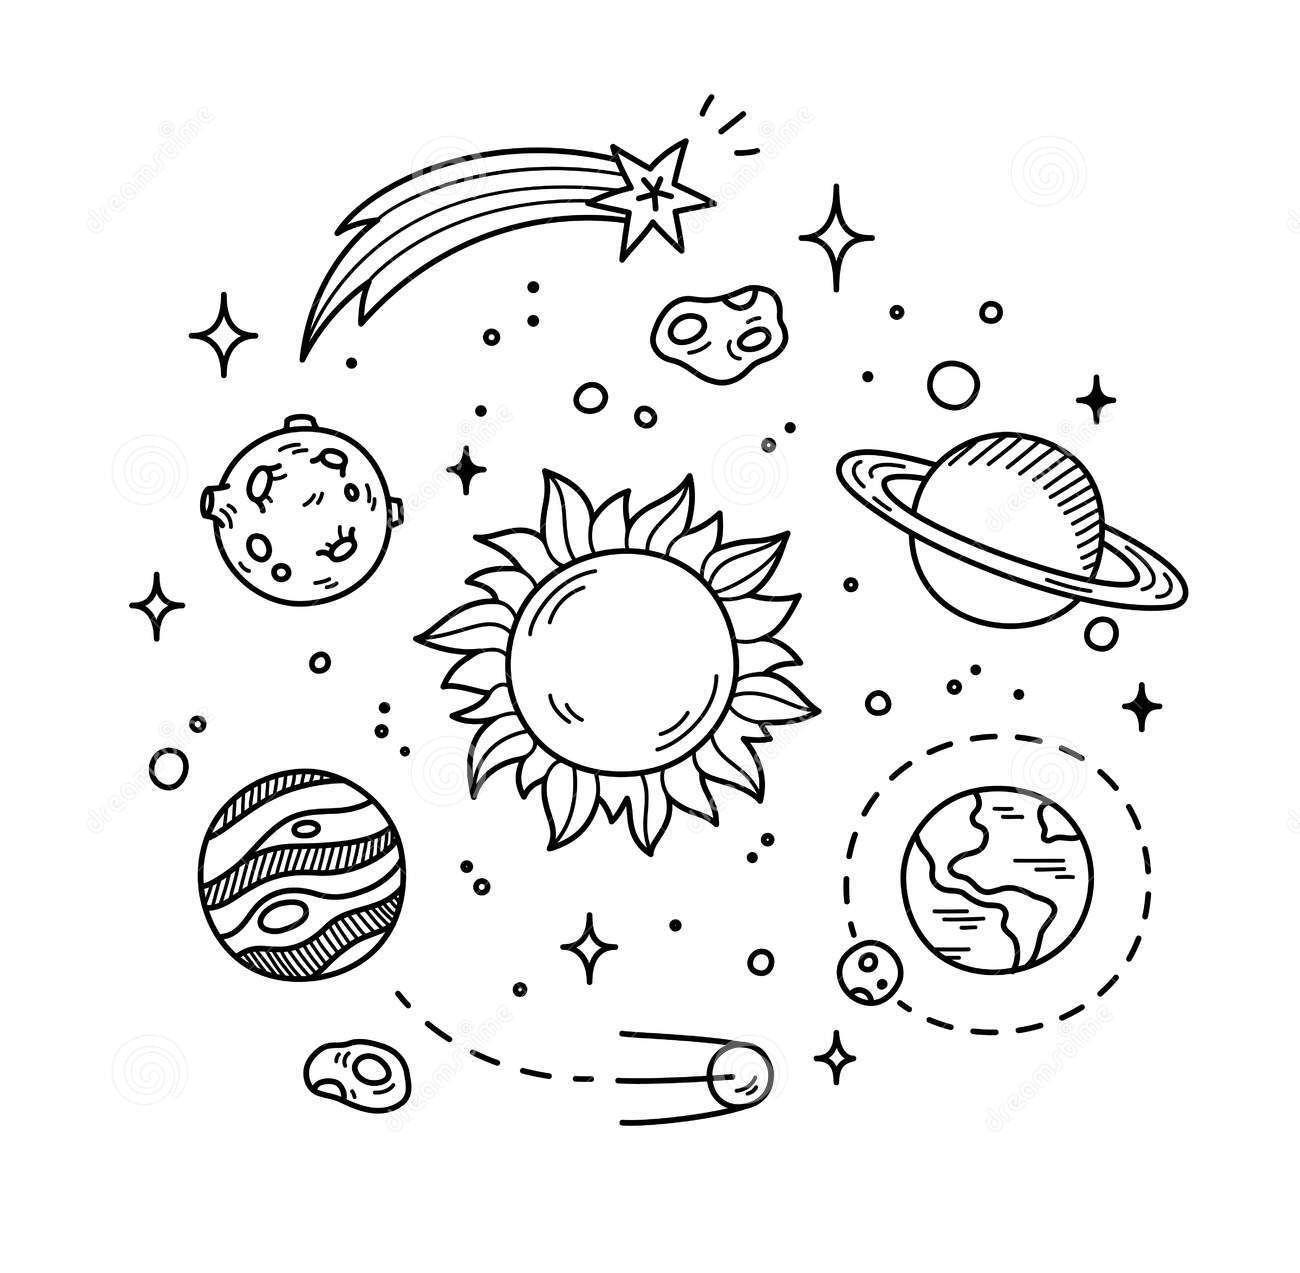 Moon Doodles